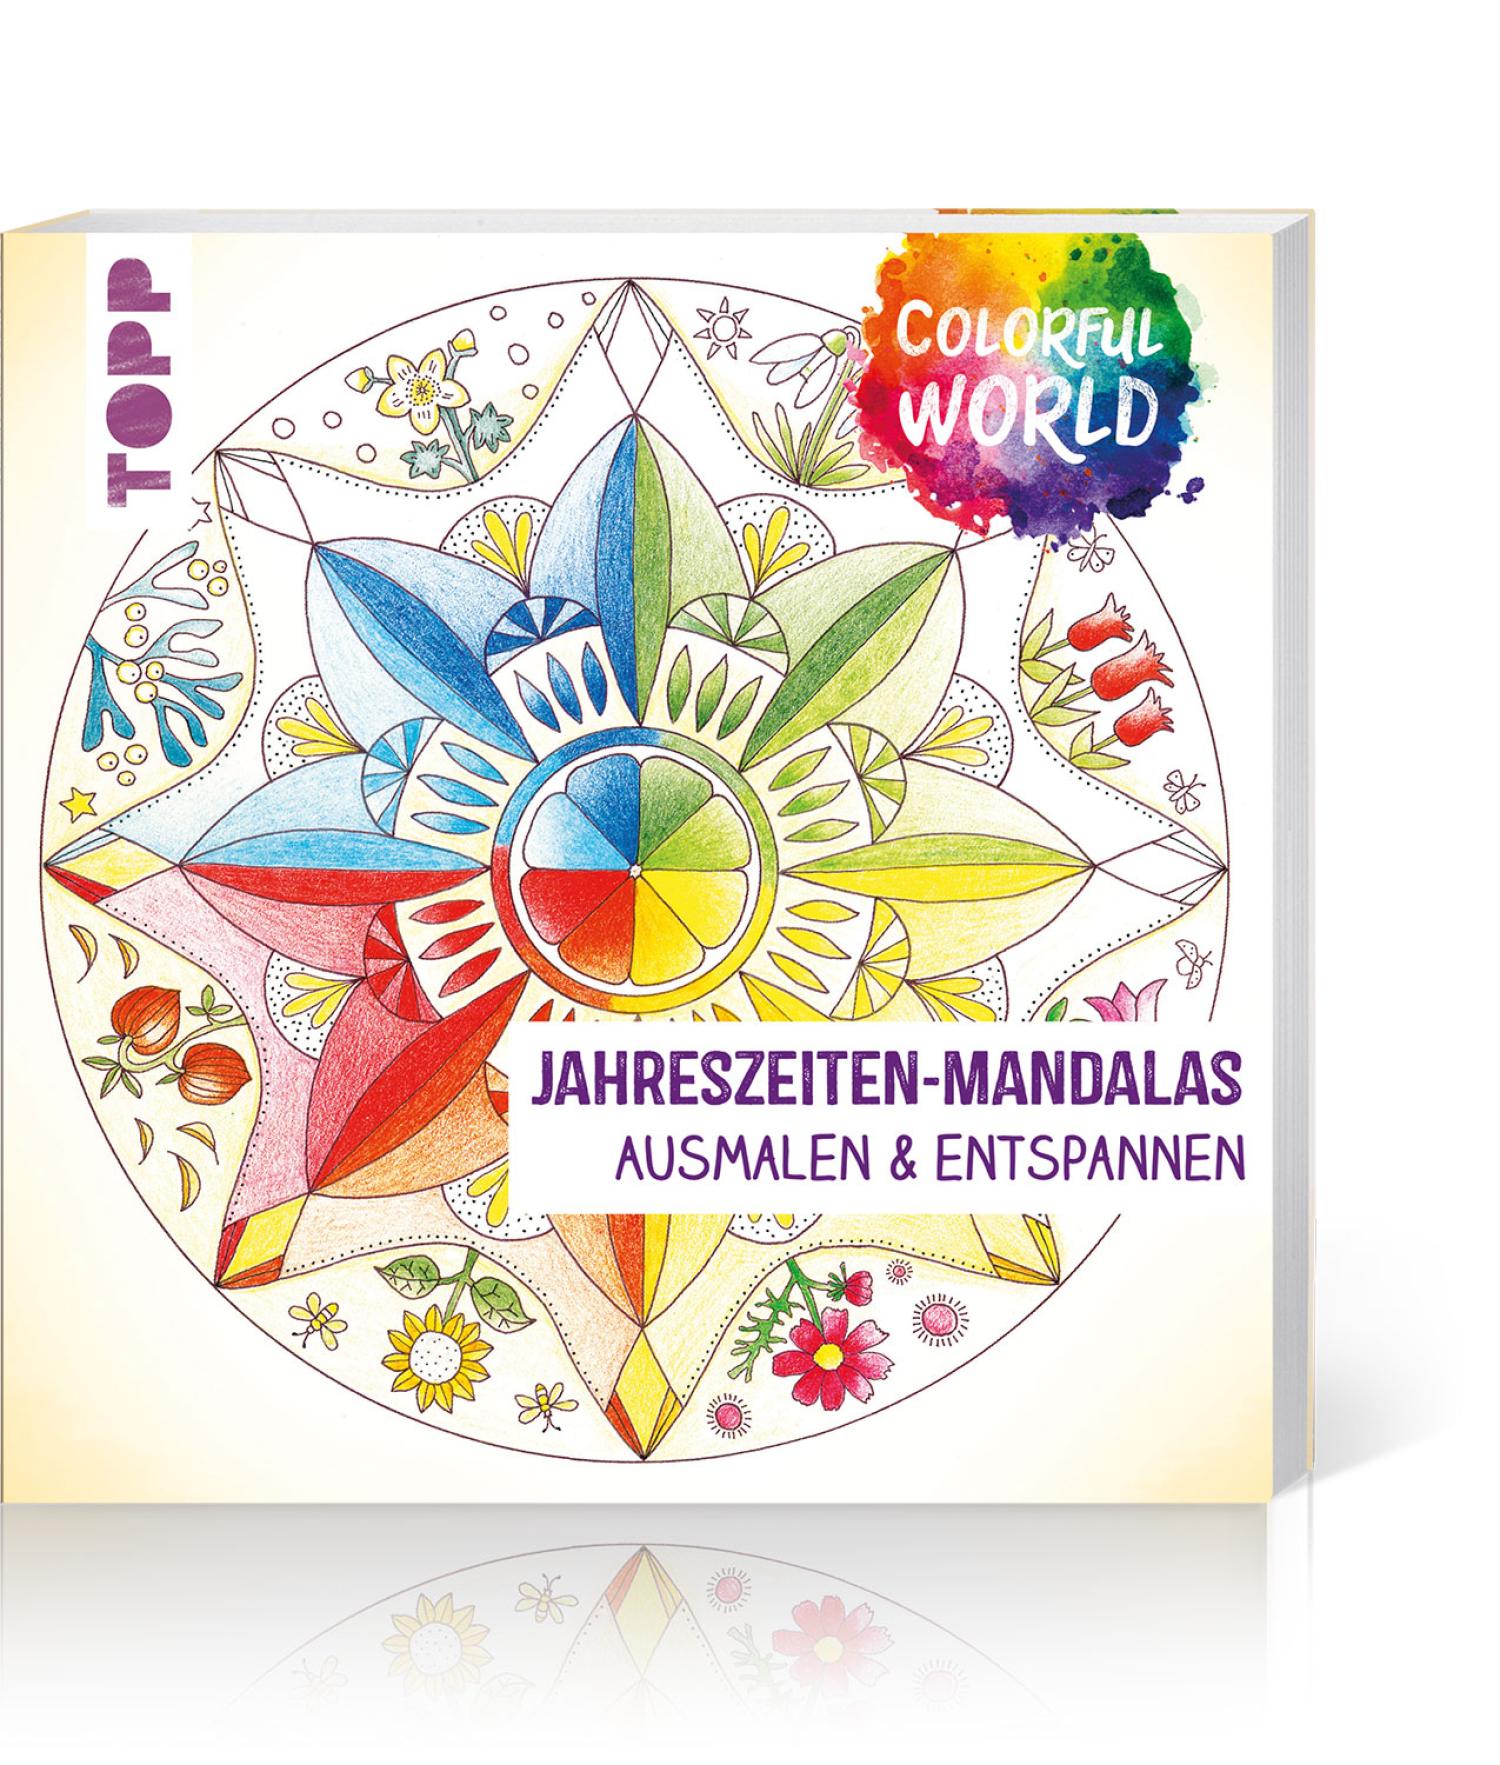 Colorful World – Jahreszeiten-Mandalas, Produktbild 1